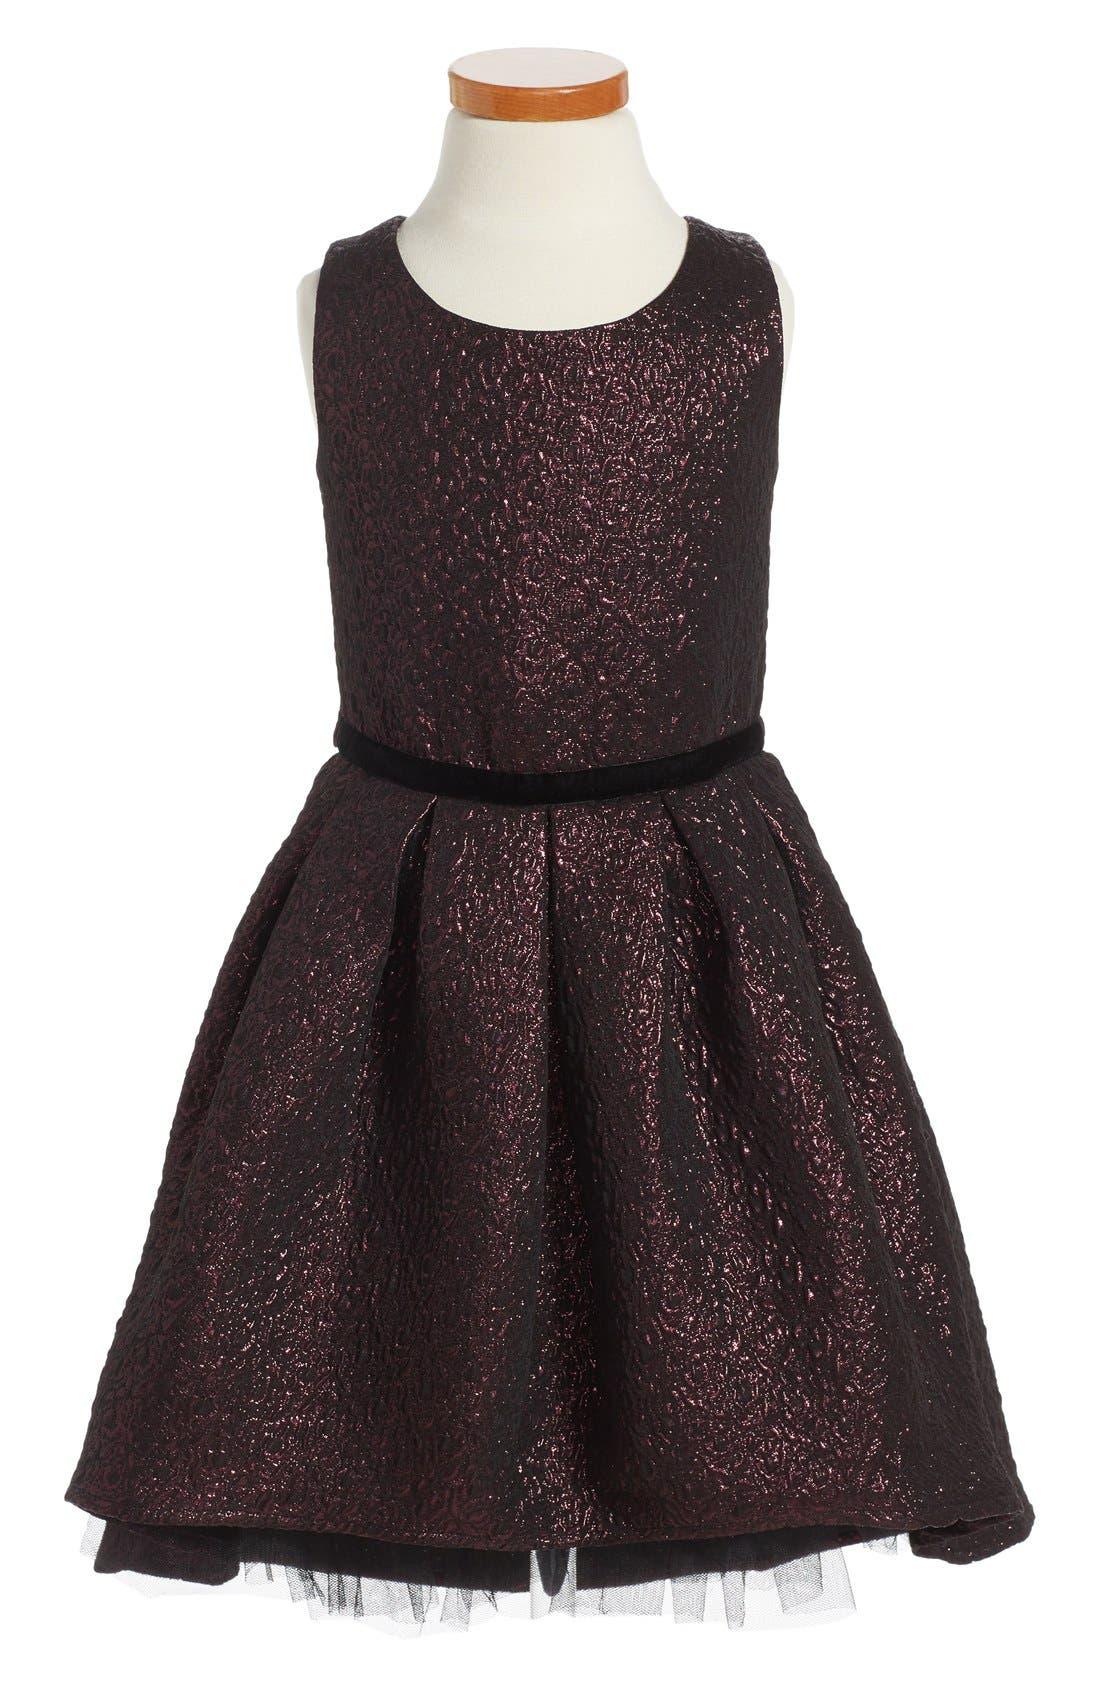 Alternate Image 1 Selected - Zunie Brocade Fit & Flare Dress (Toddler Girls, Little Girls & Big Girls)